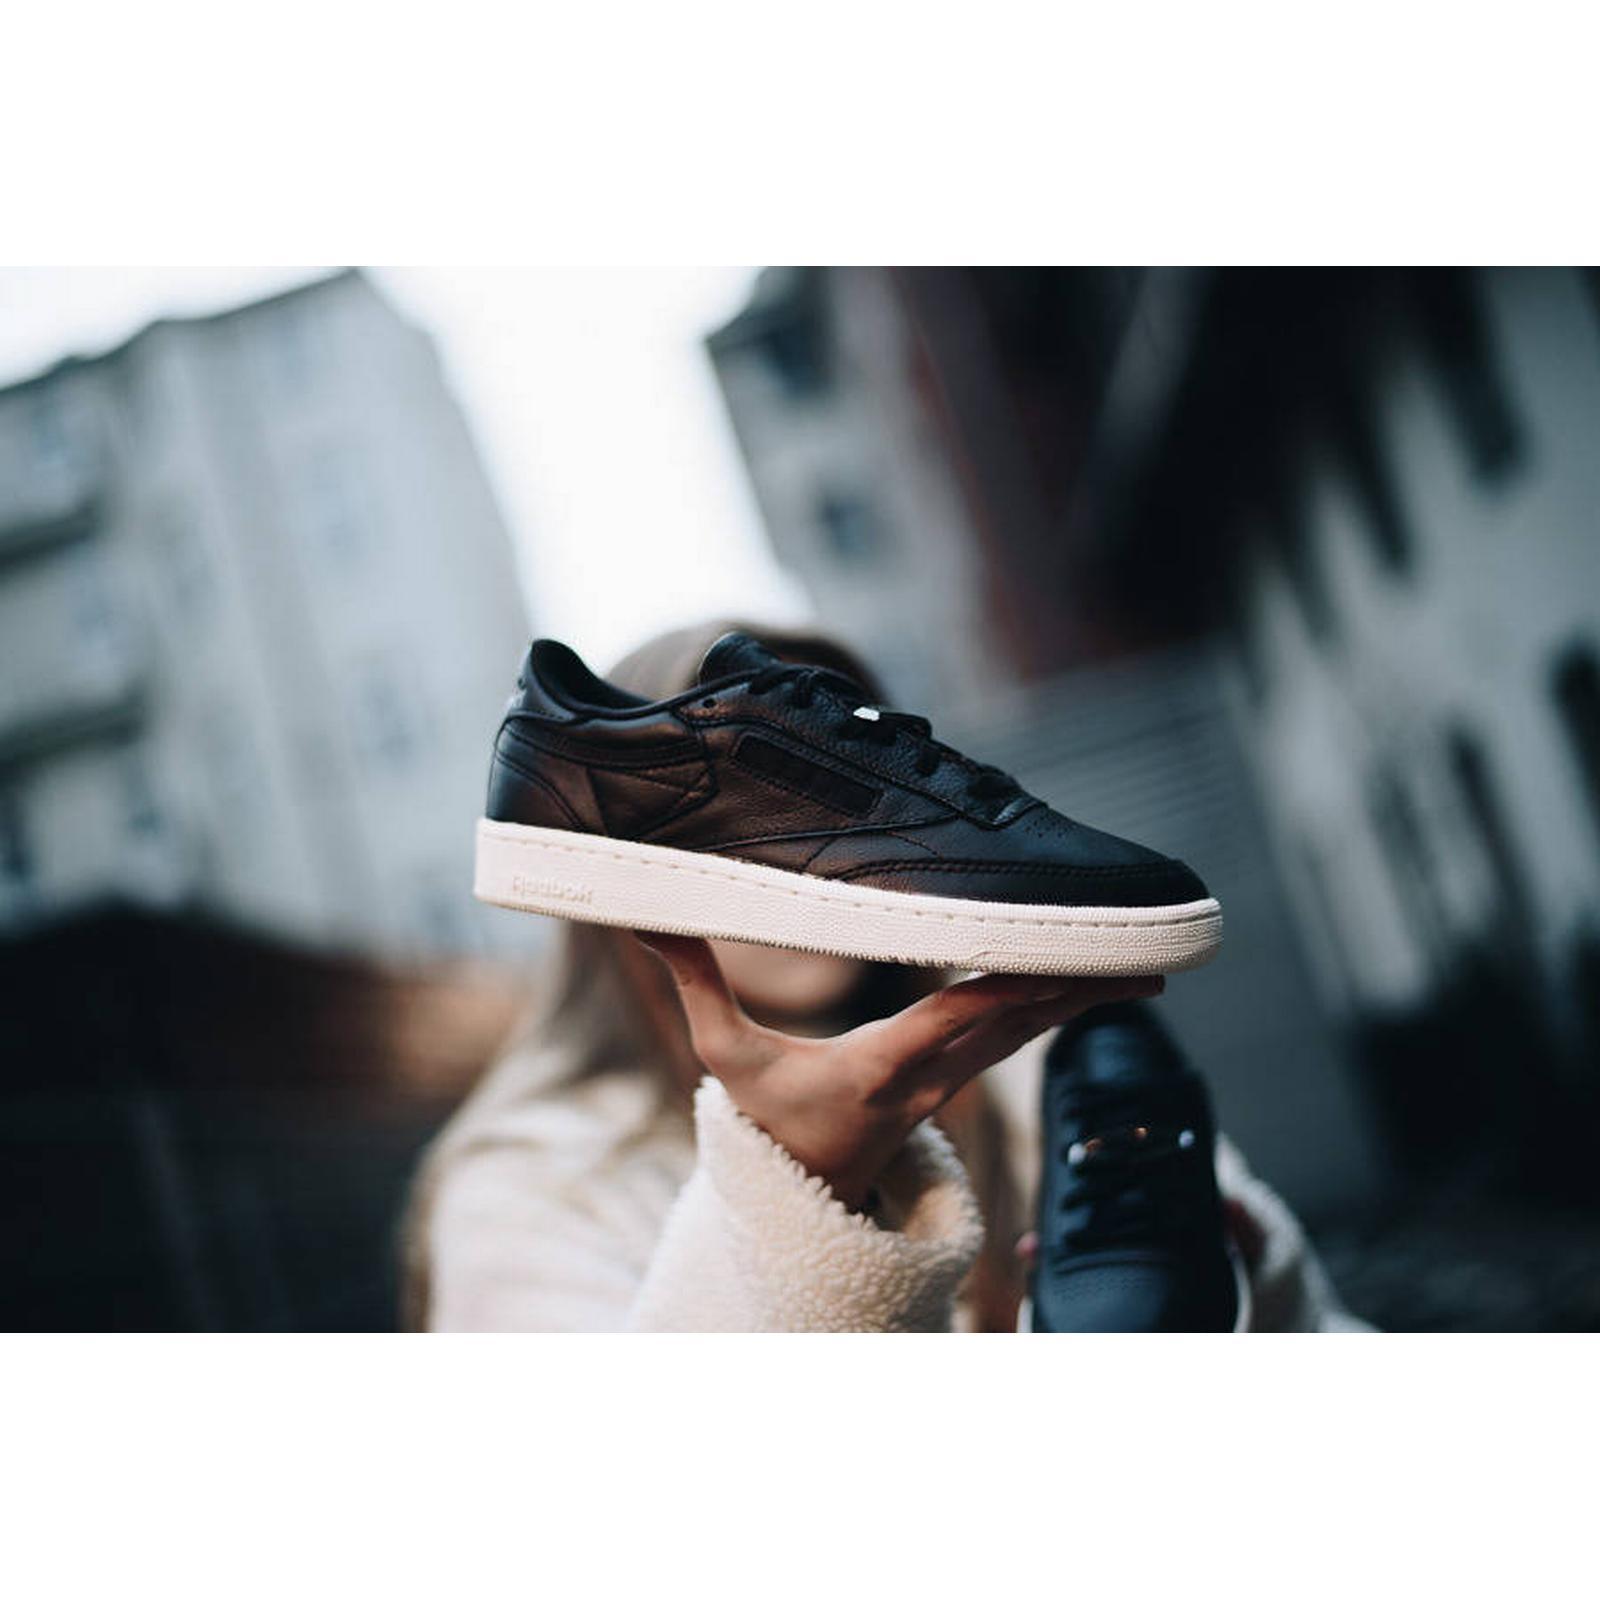 Reebok Classic Women's C Shoes sneakers Reebok Club C Women's 85 Hardware Black BS9596 BLACK Size 38 307f1c